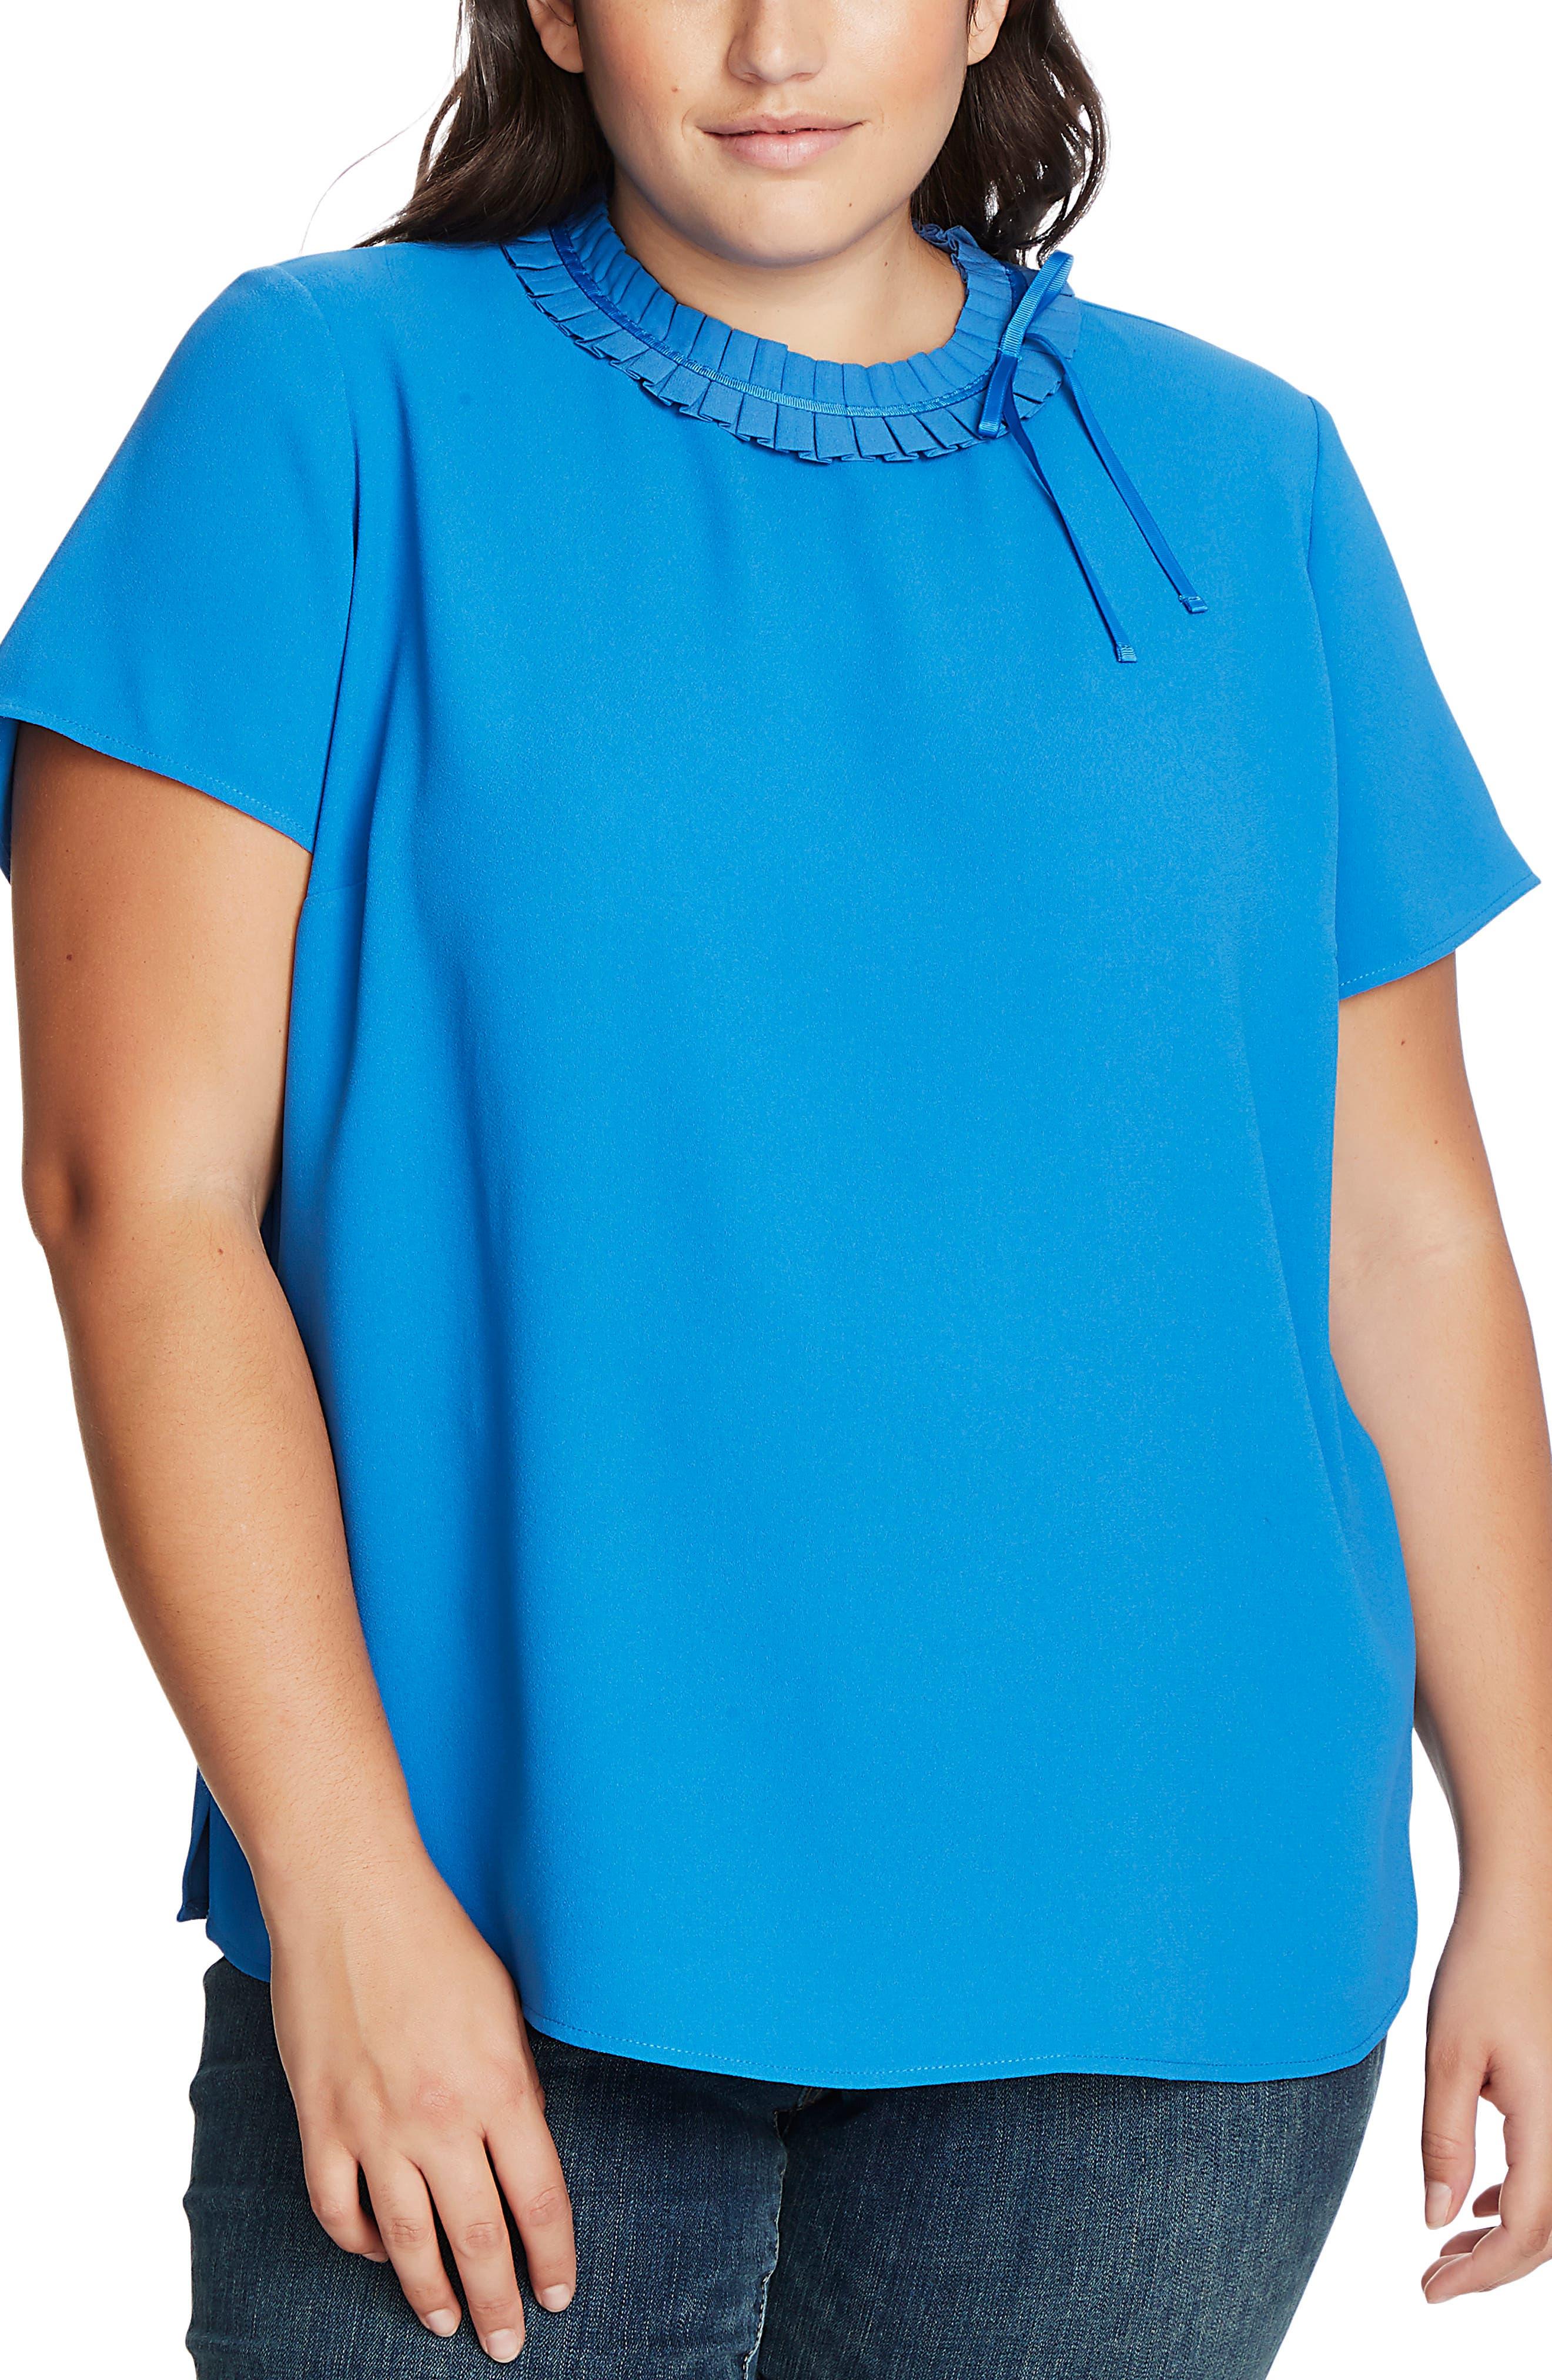 Vintage Tops & Retro Shirts, Halter Tops, Blouses Plus Size Womens Cece Pleated Collar Short Sleeve Crepe Blouse $53.40 AT vintagedancer.com